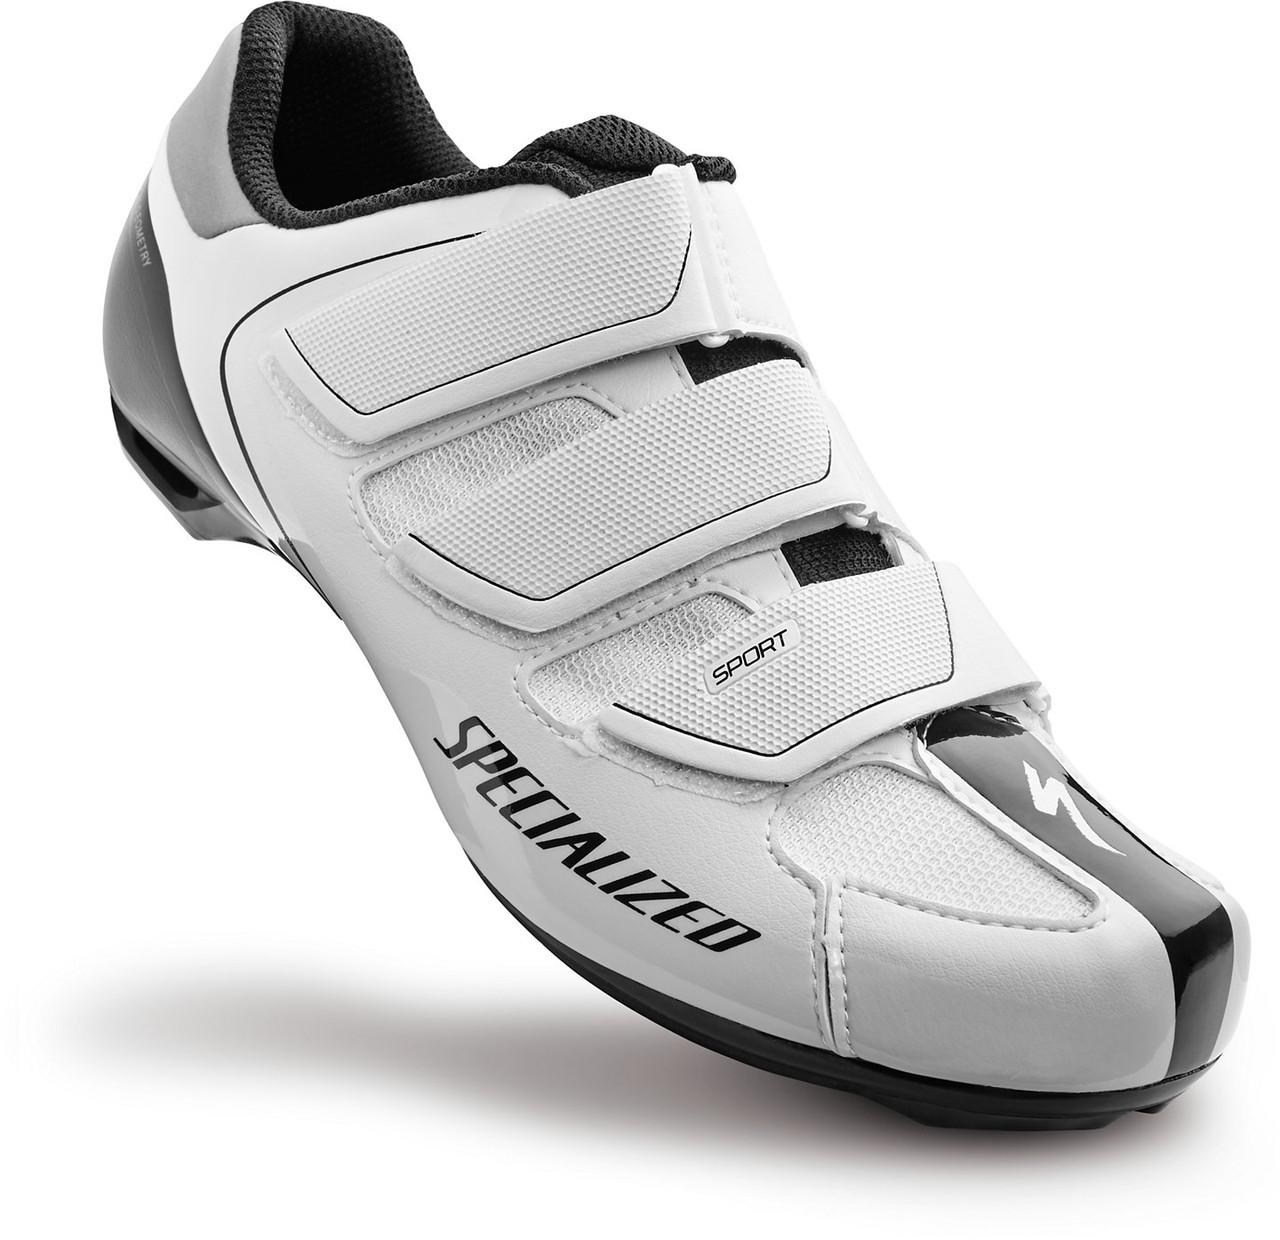 Велотуфли Specialized Road Sport 44 размер белые